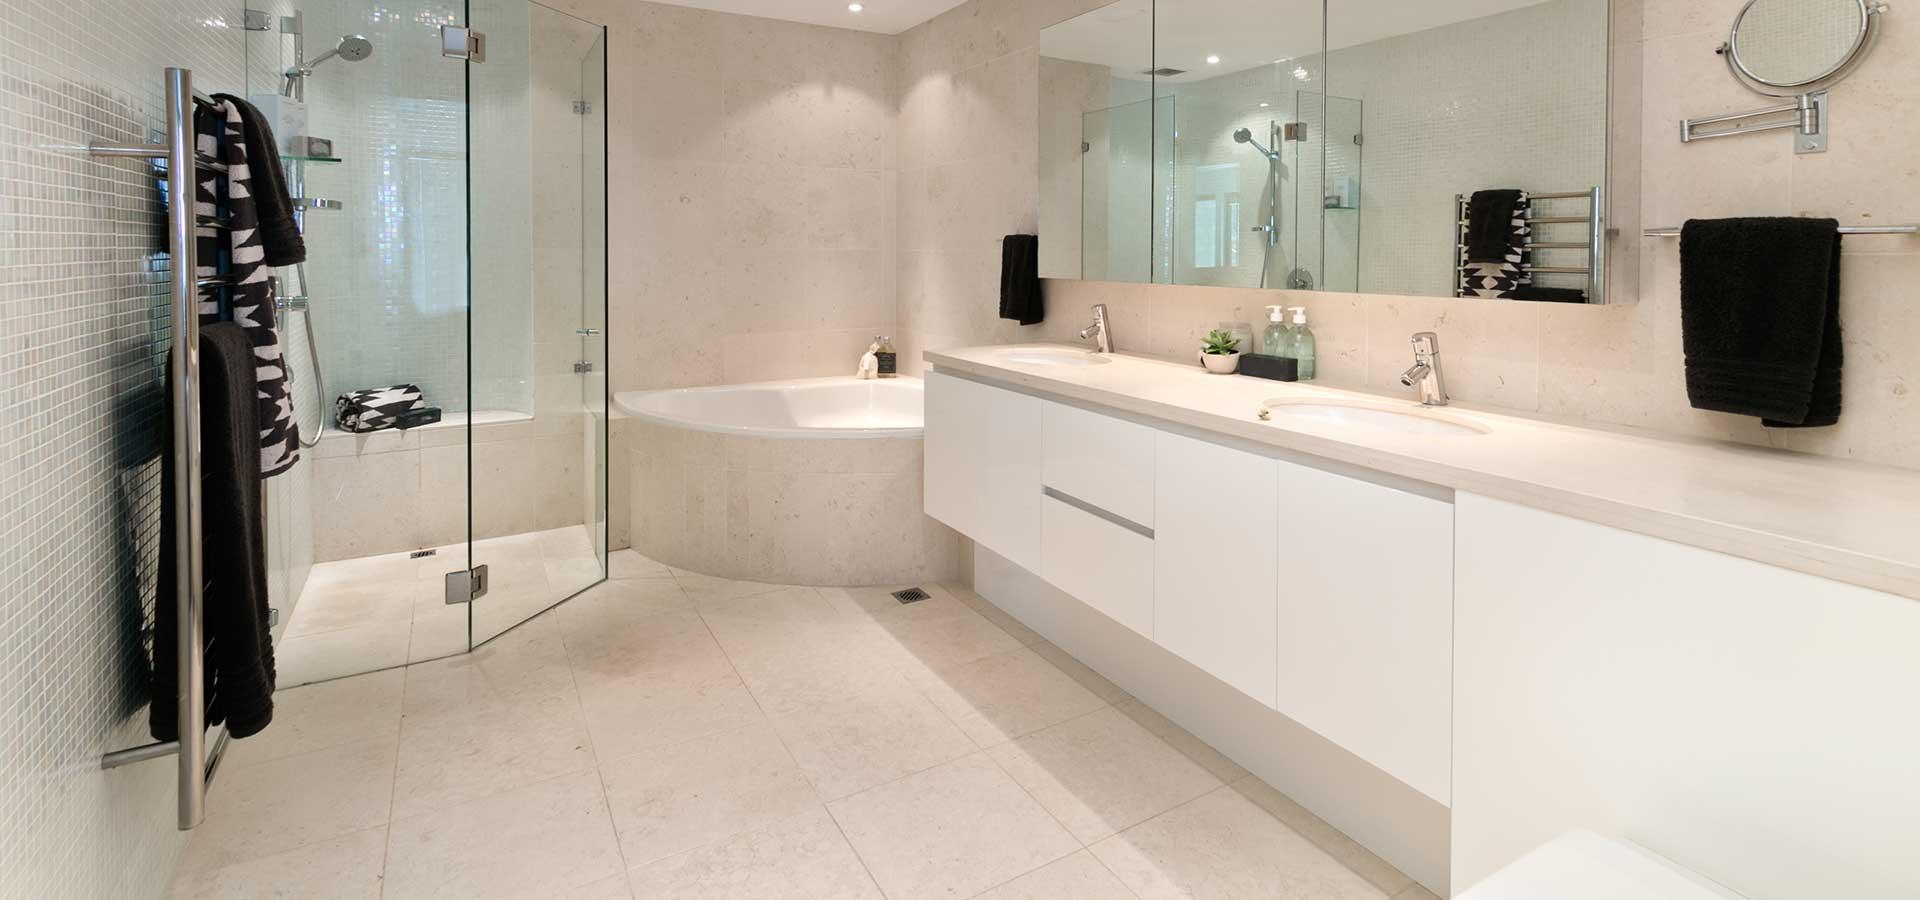 Armoire salle de bain magog sherbrooke bromont granby for Armoires cuisine sherbrooke